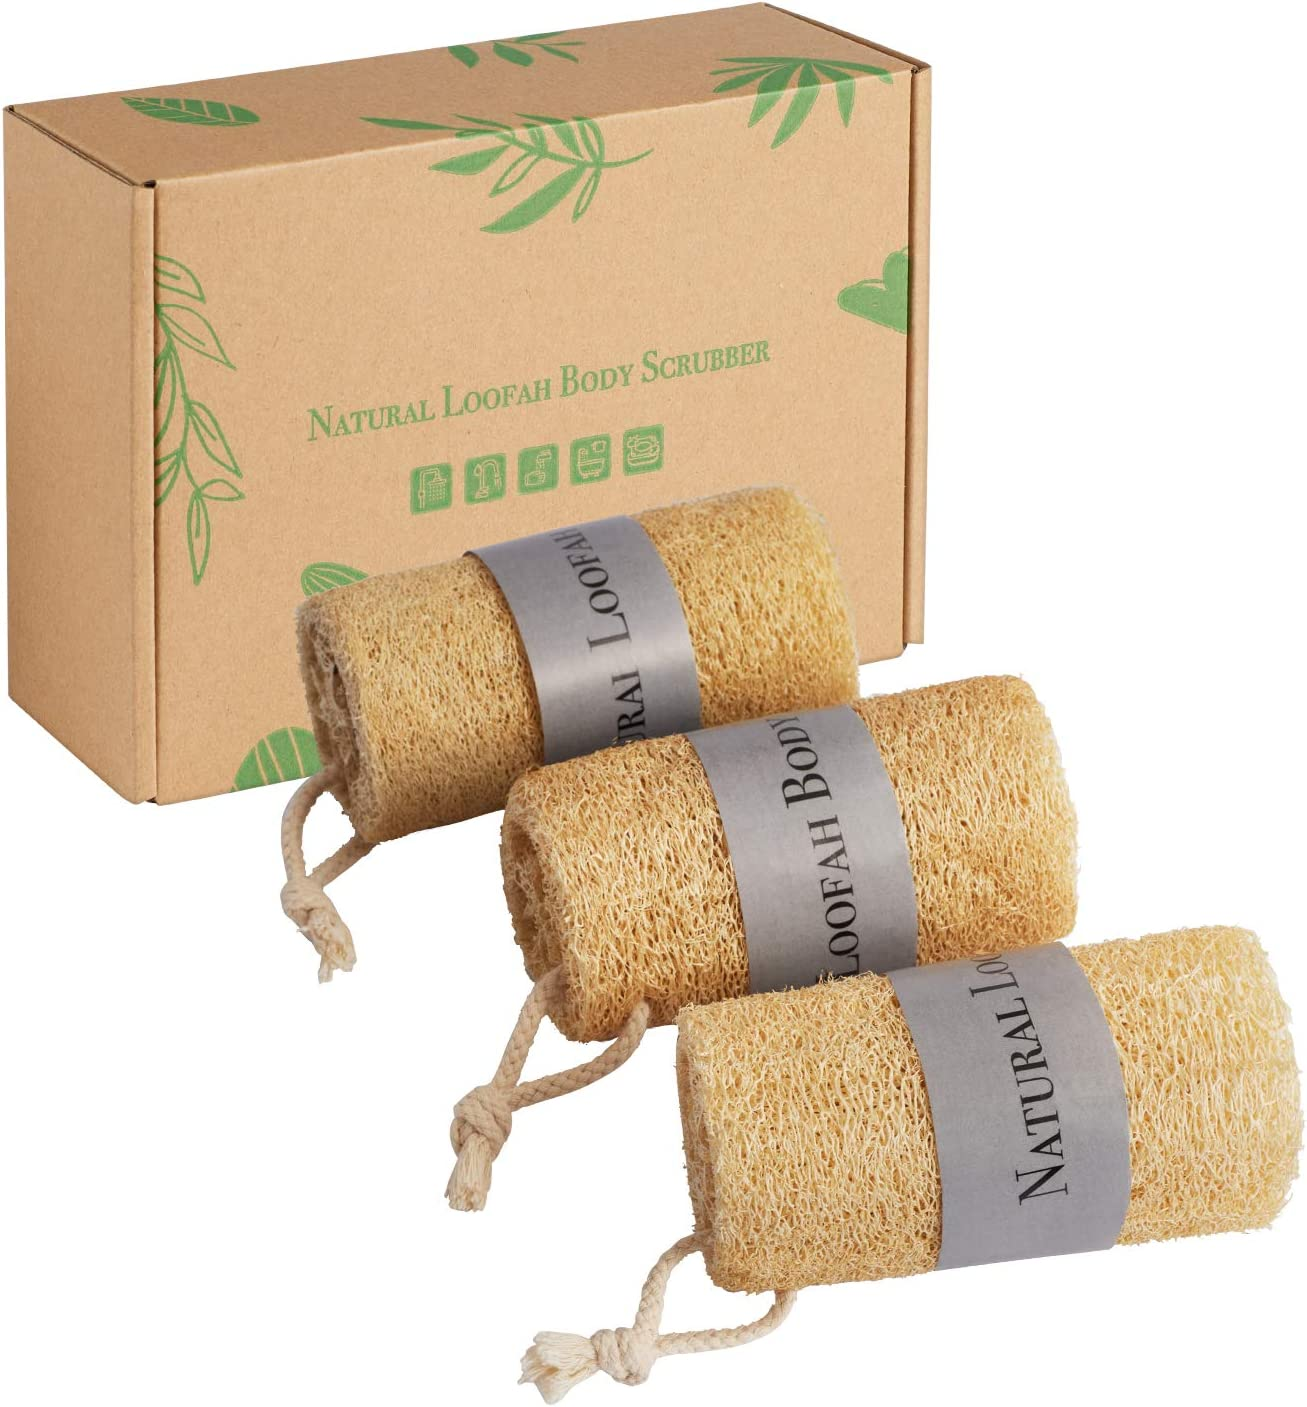 Natural Loofah Sponge Exfoliating Scrubber, Body Shower Bath Luffa Organic Exfoliator Men & Women, 100% Eco-Friendly Loofahs Brush Sponge: Health & Personal Care